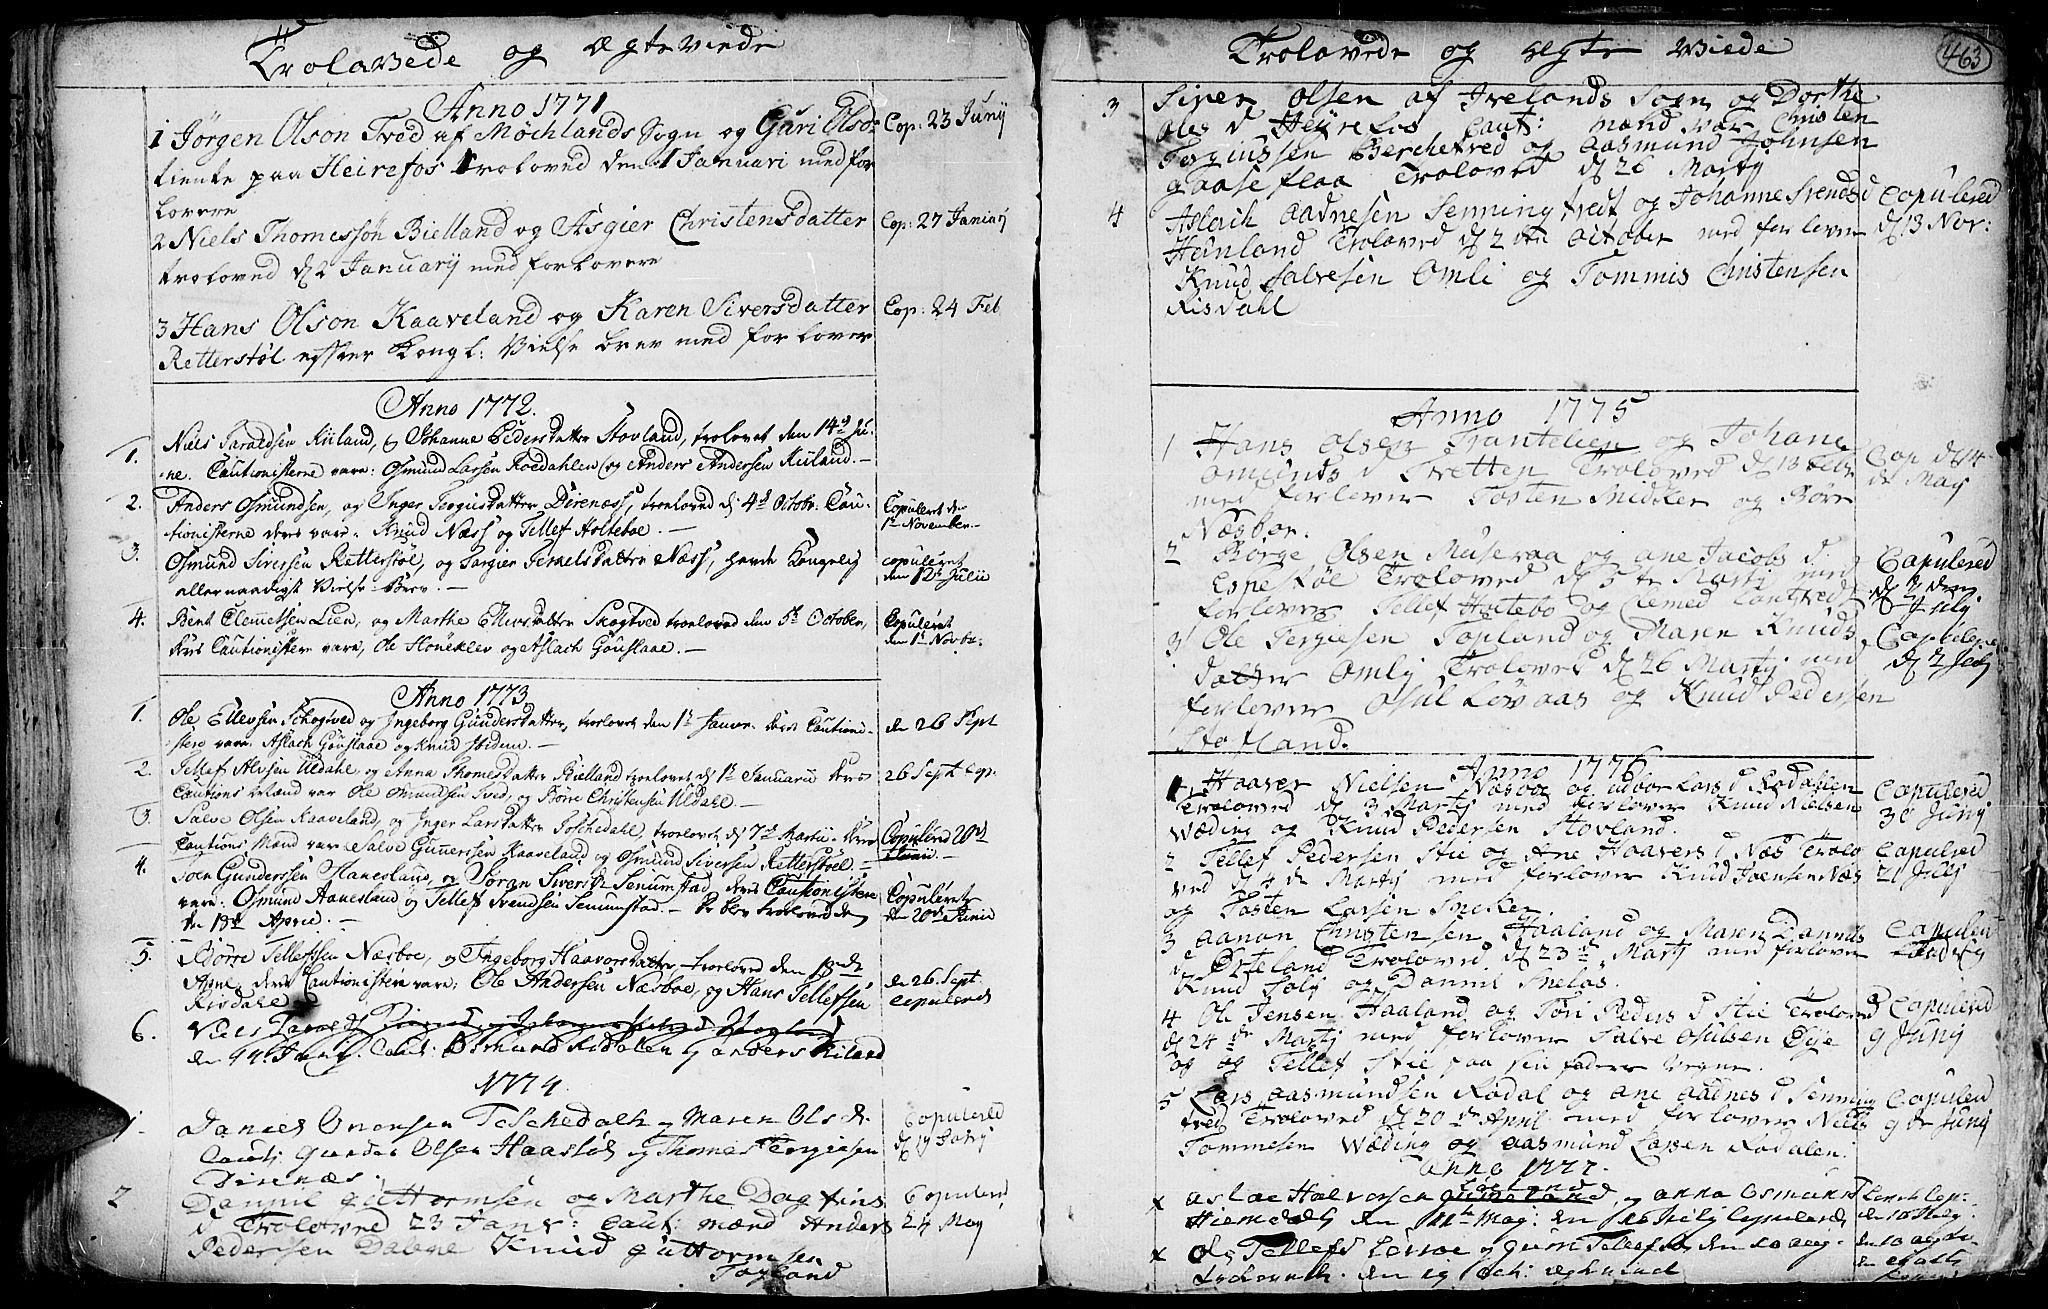 SAK, Hommedal sokneprestkontor, F/Fa/Fab/L0002: Ministerialbok nr. A 2 /3, 1740-1821, s. 463